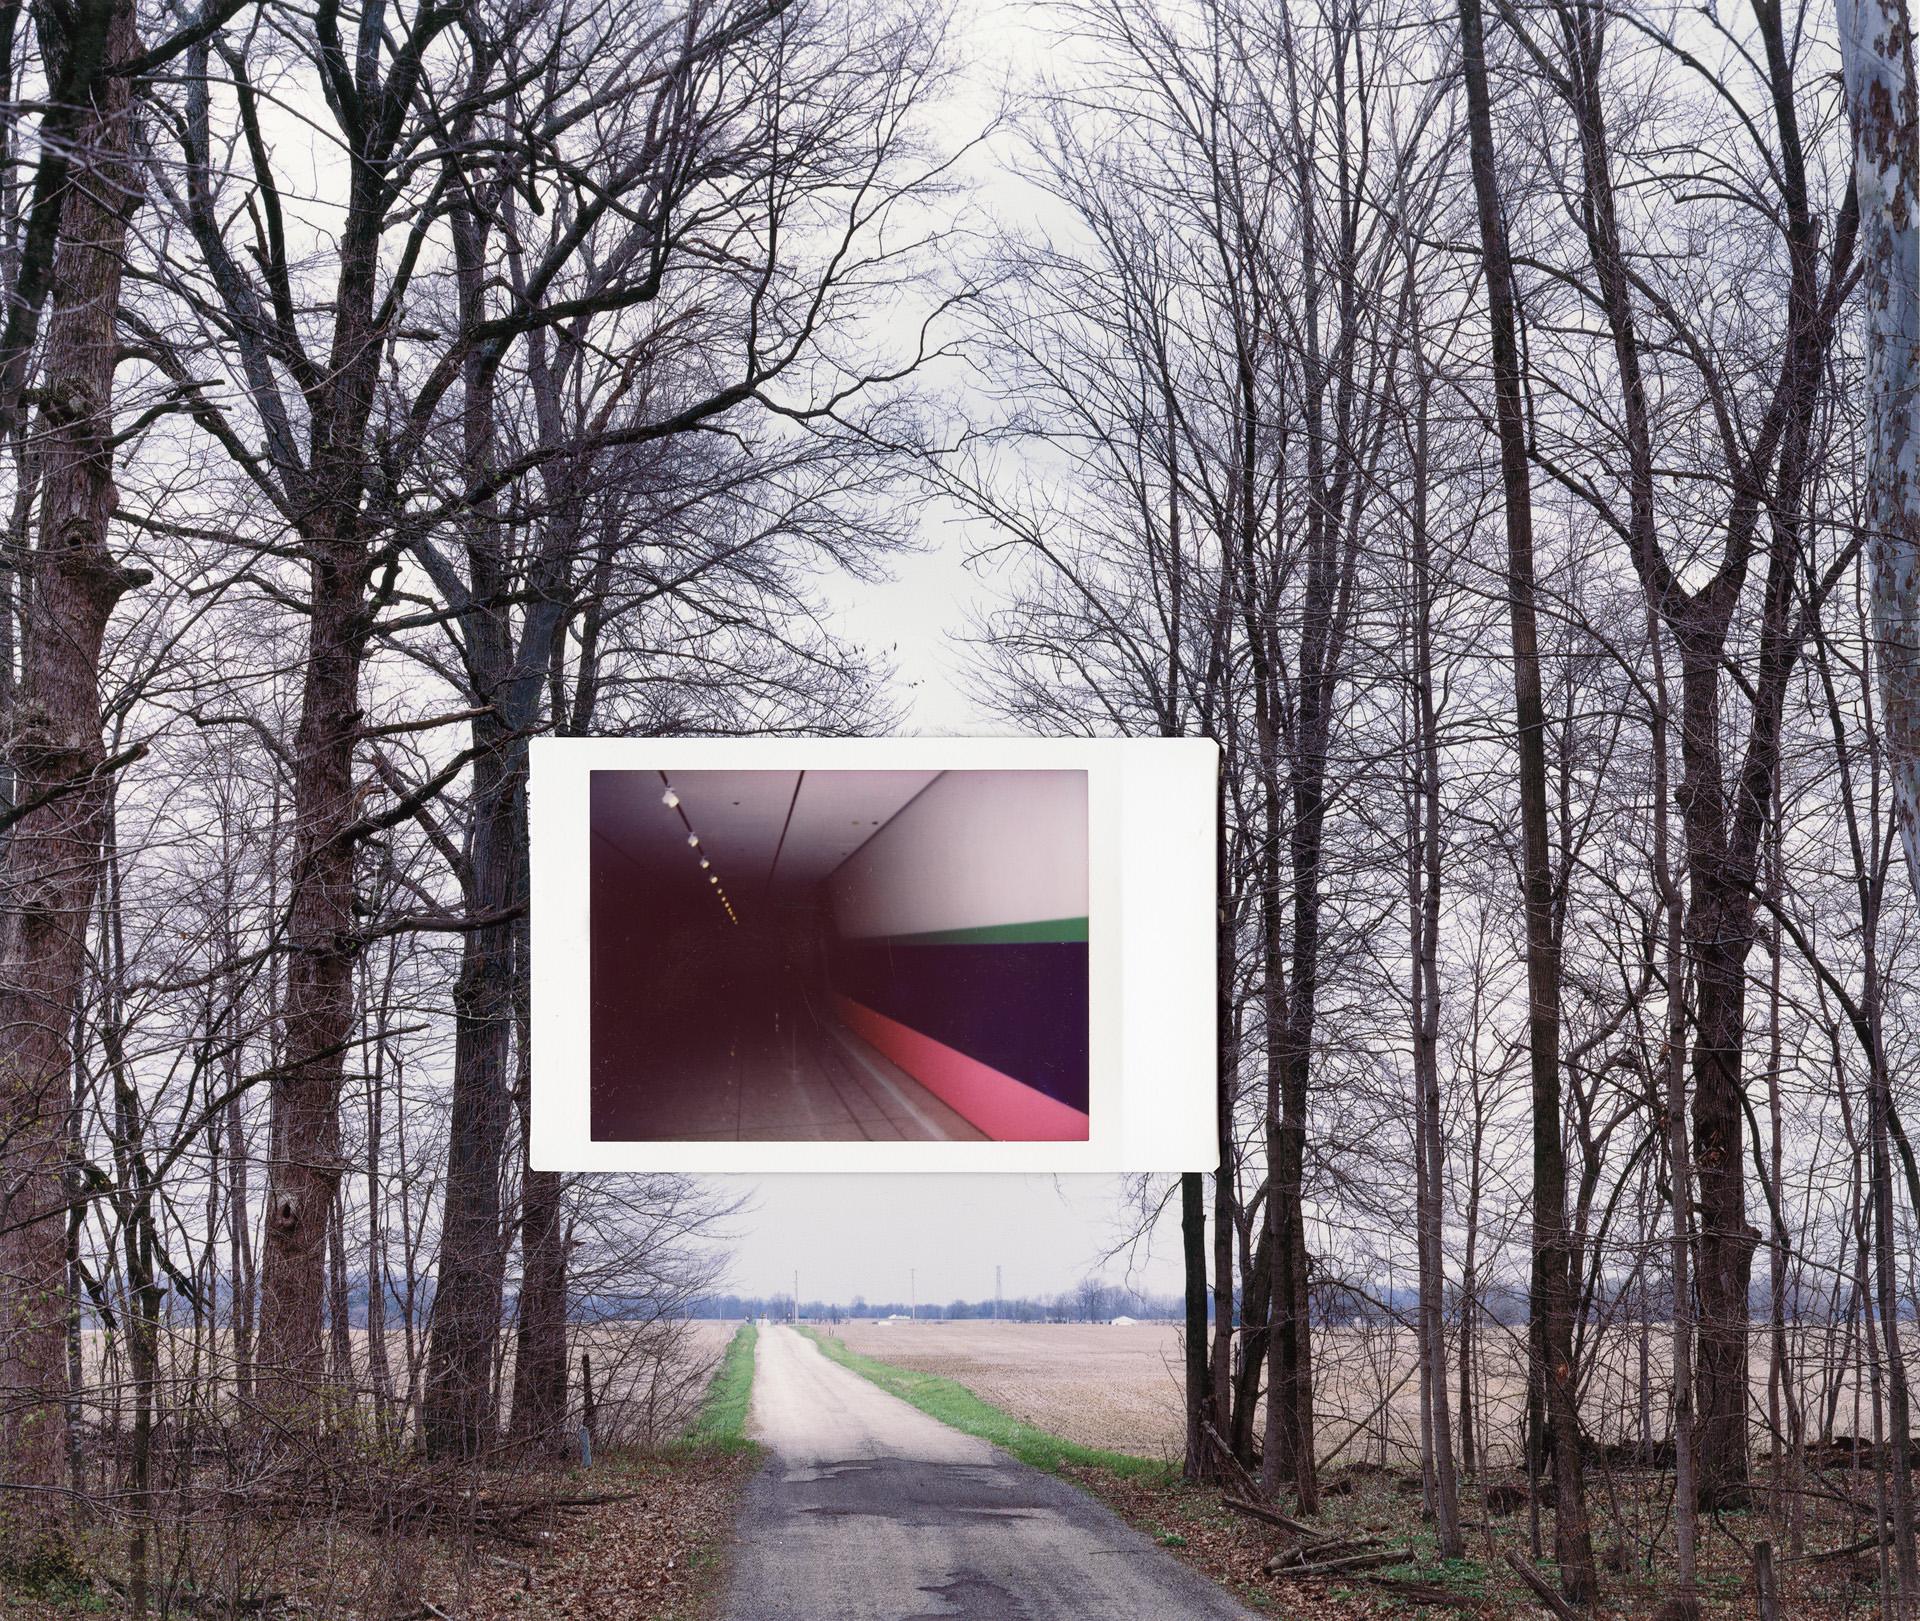 Road Through Trees | John Sanderson